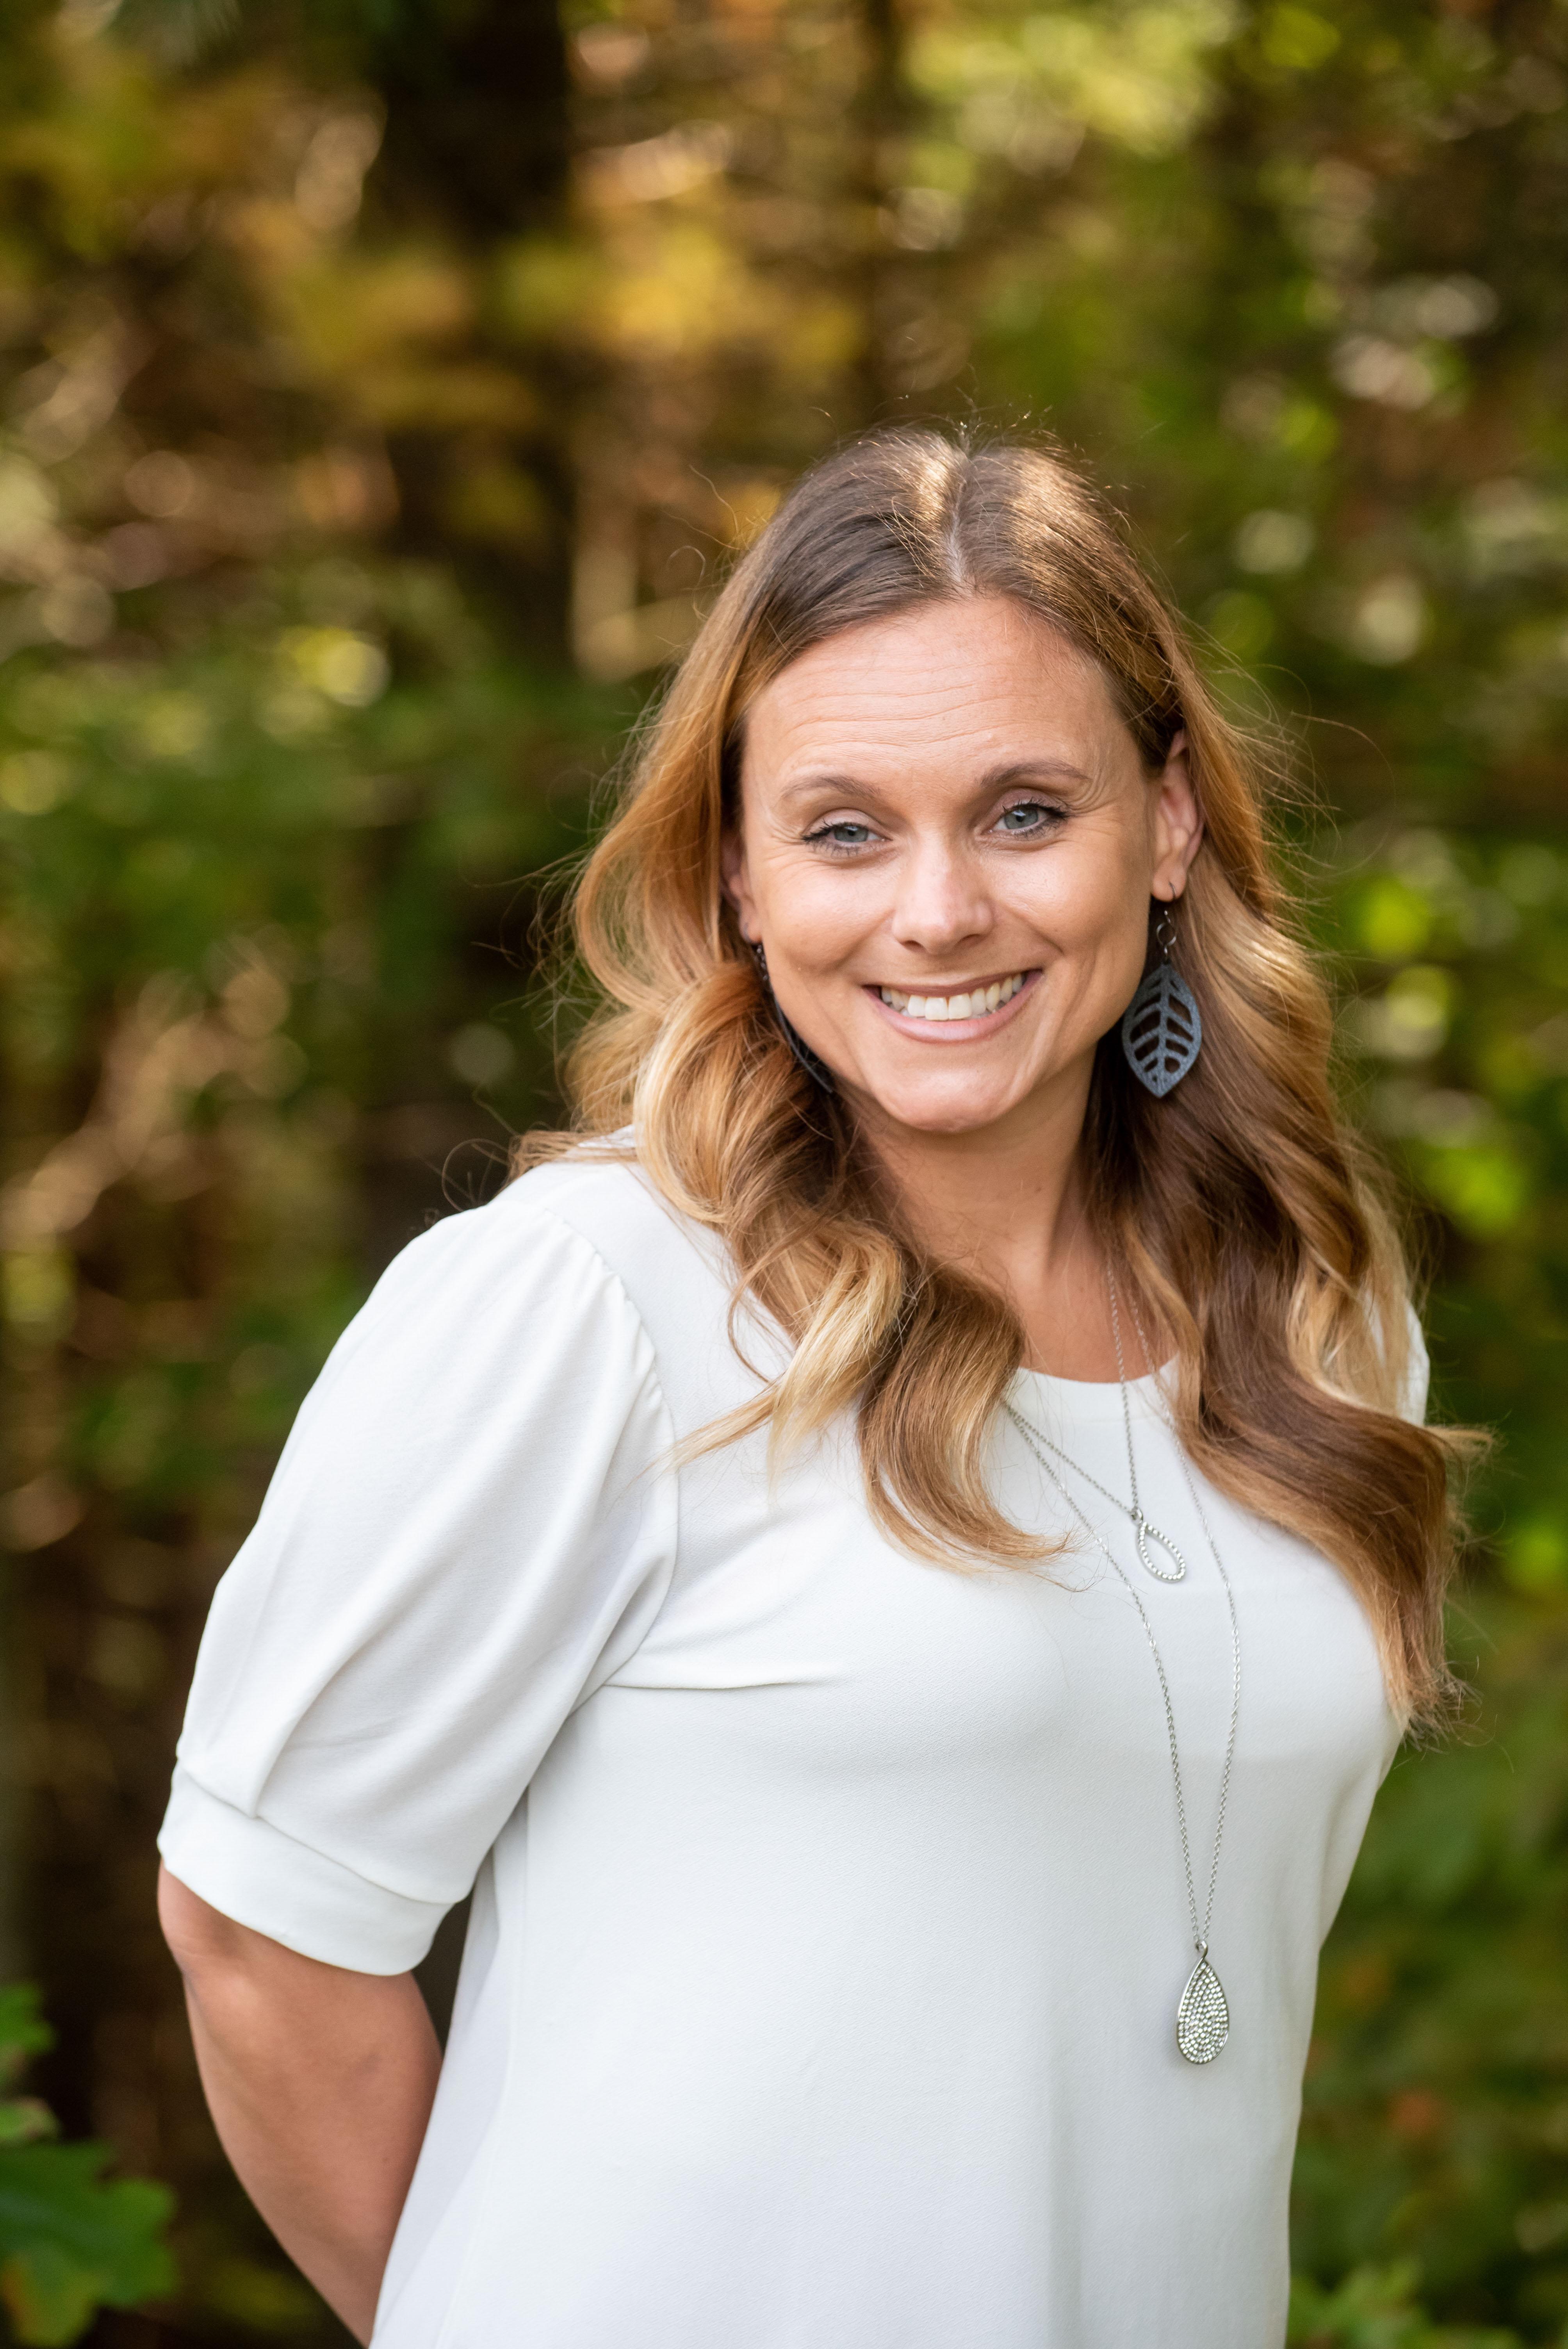 Allison Bonner